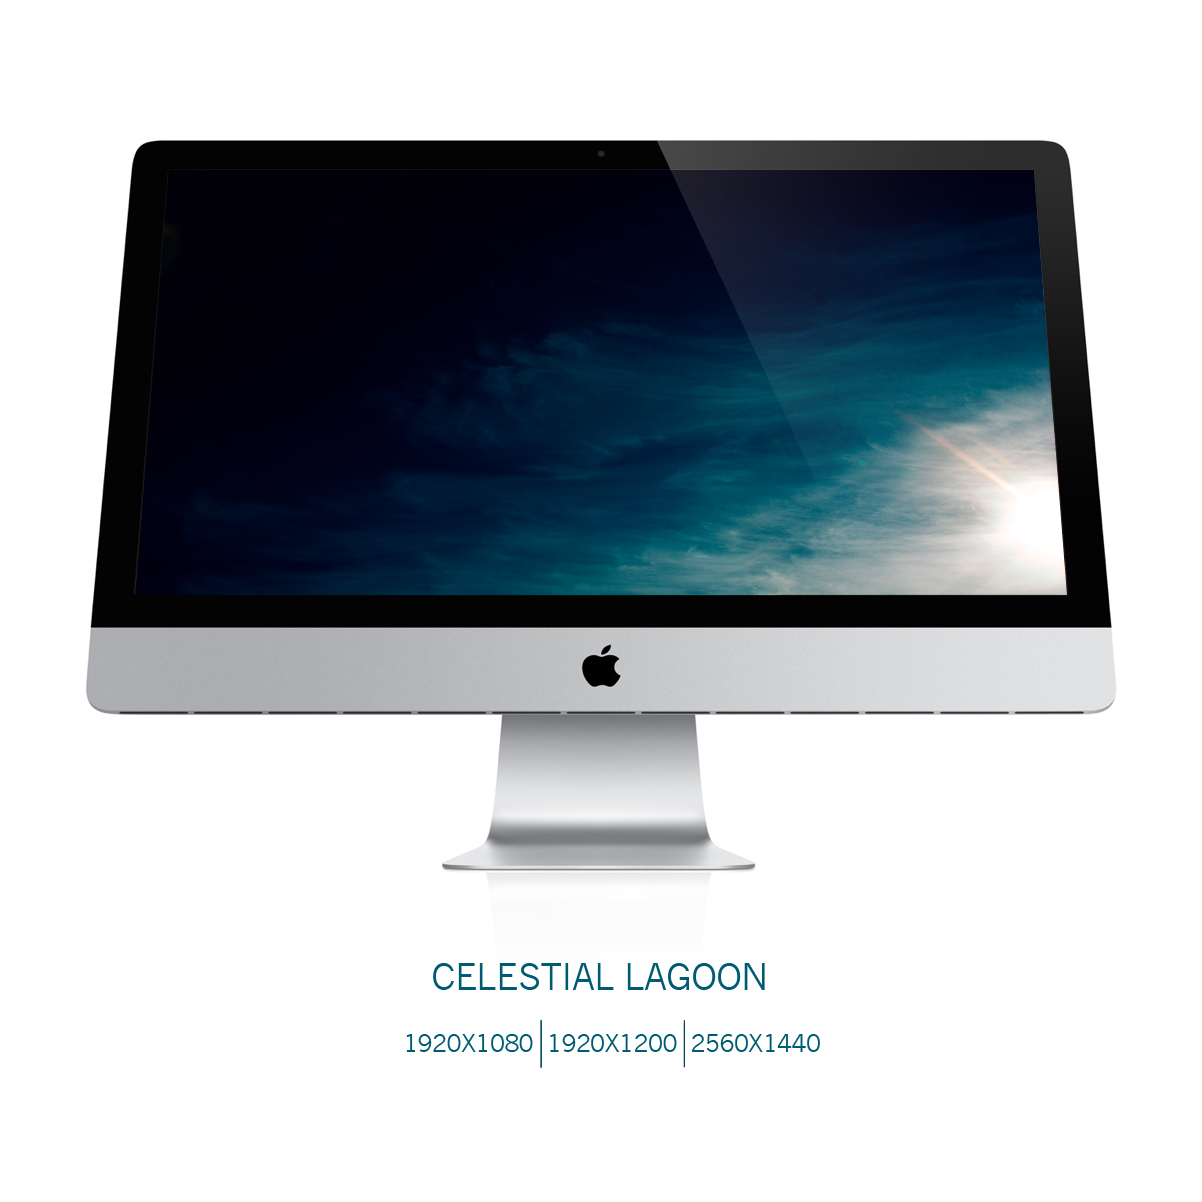 Celestial Lagoon by Peleber